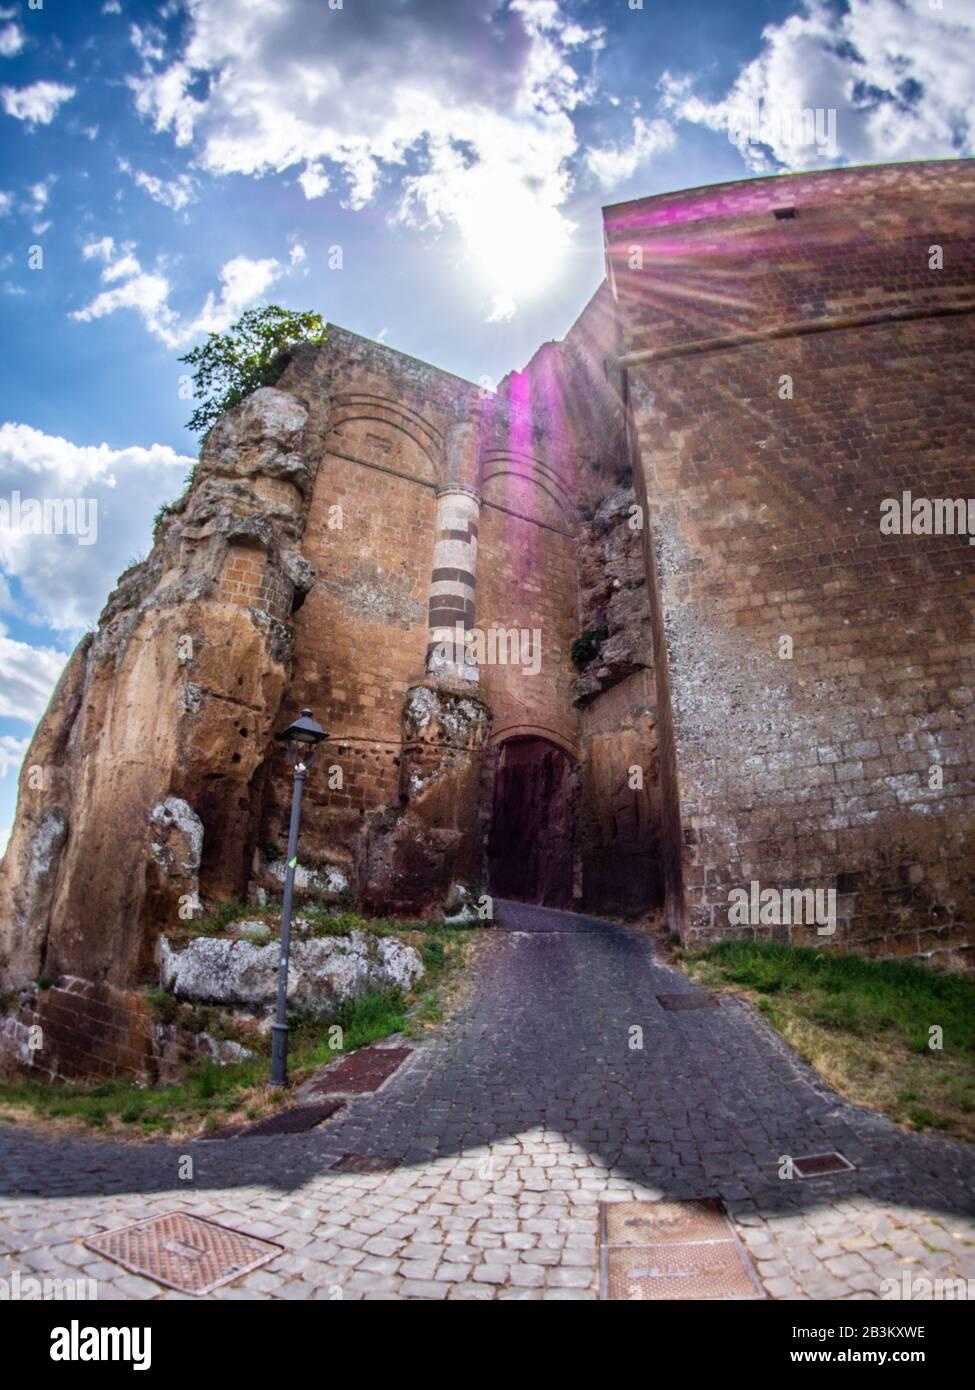 Italia, Umbría, Orvieto, Albornoz fortaleza, ahora jardín público Foto de stock